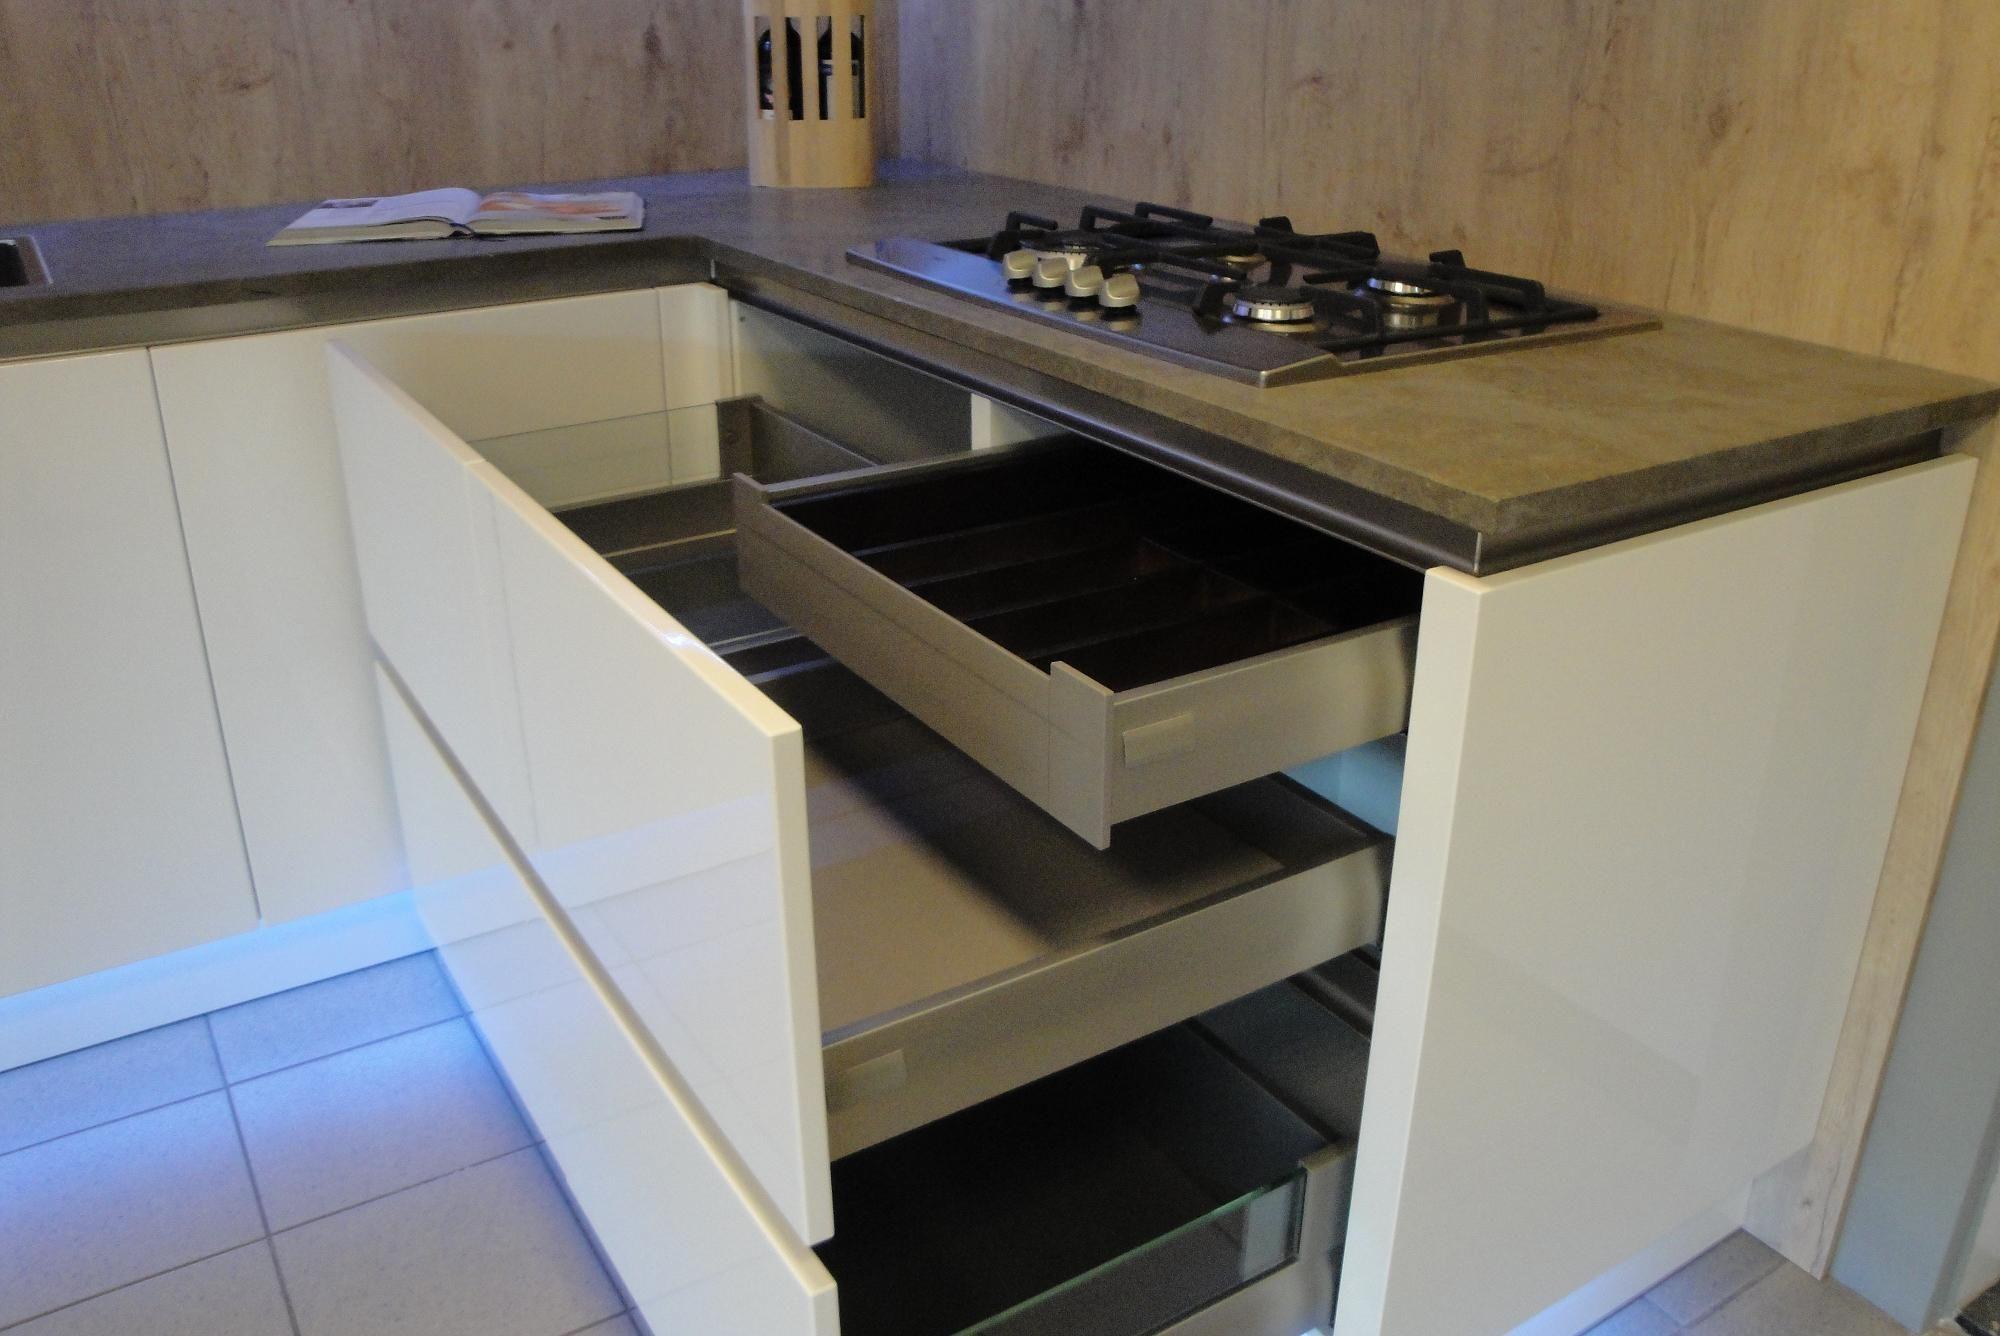 keuken carrousel le mans prijs : Hoekkast Keuken Afmetingen Atumre Com